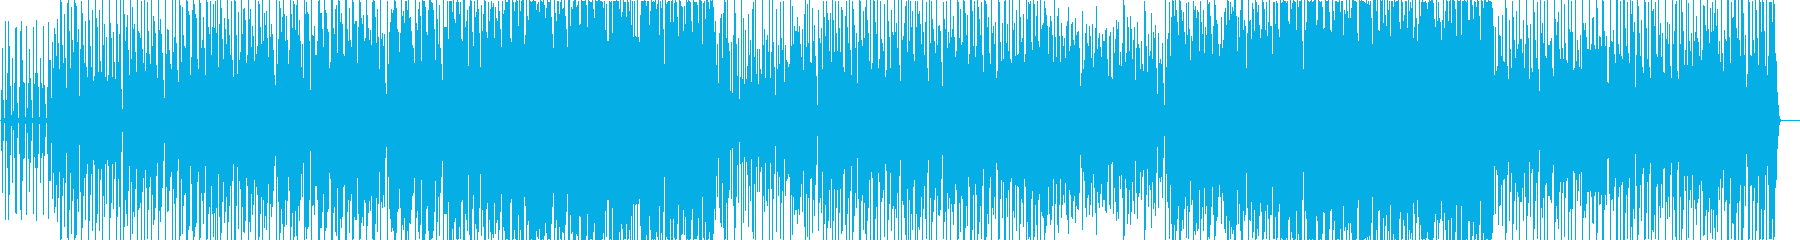 El laberintoの再生済みの波形